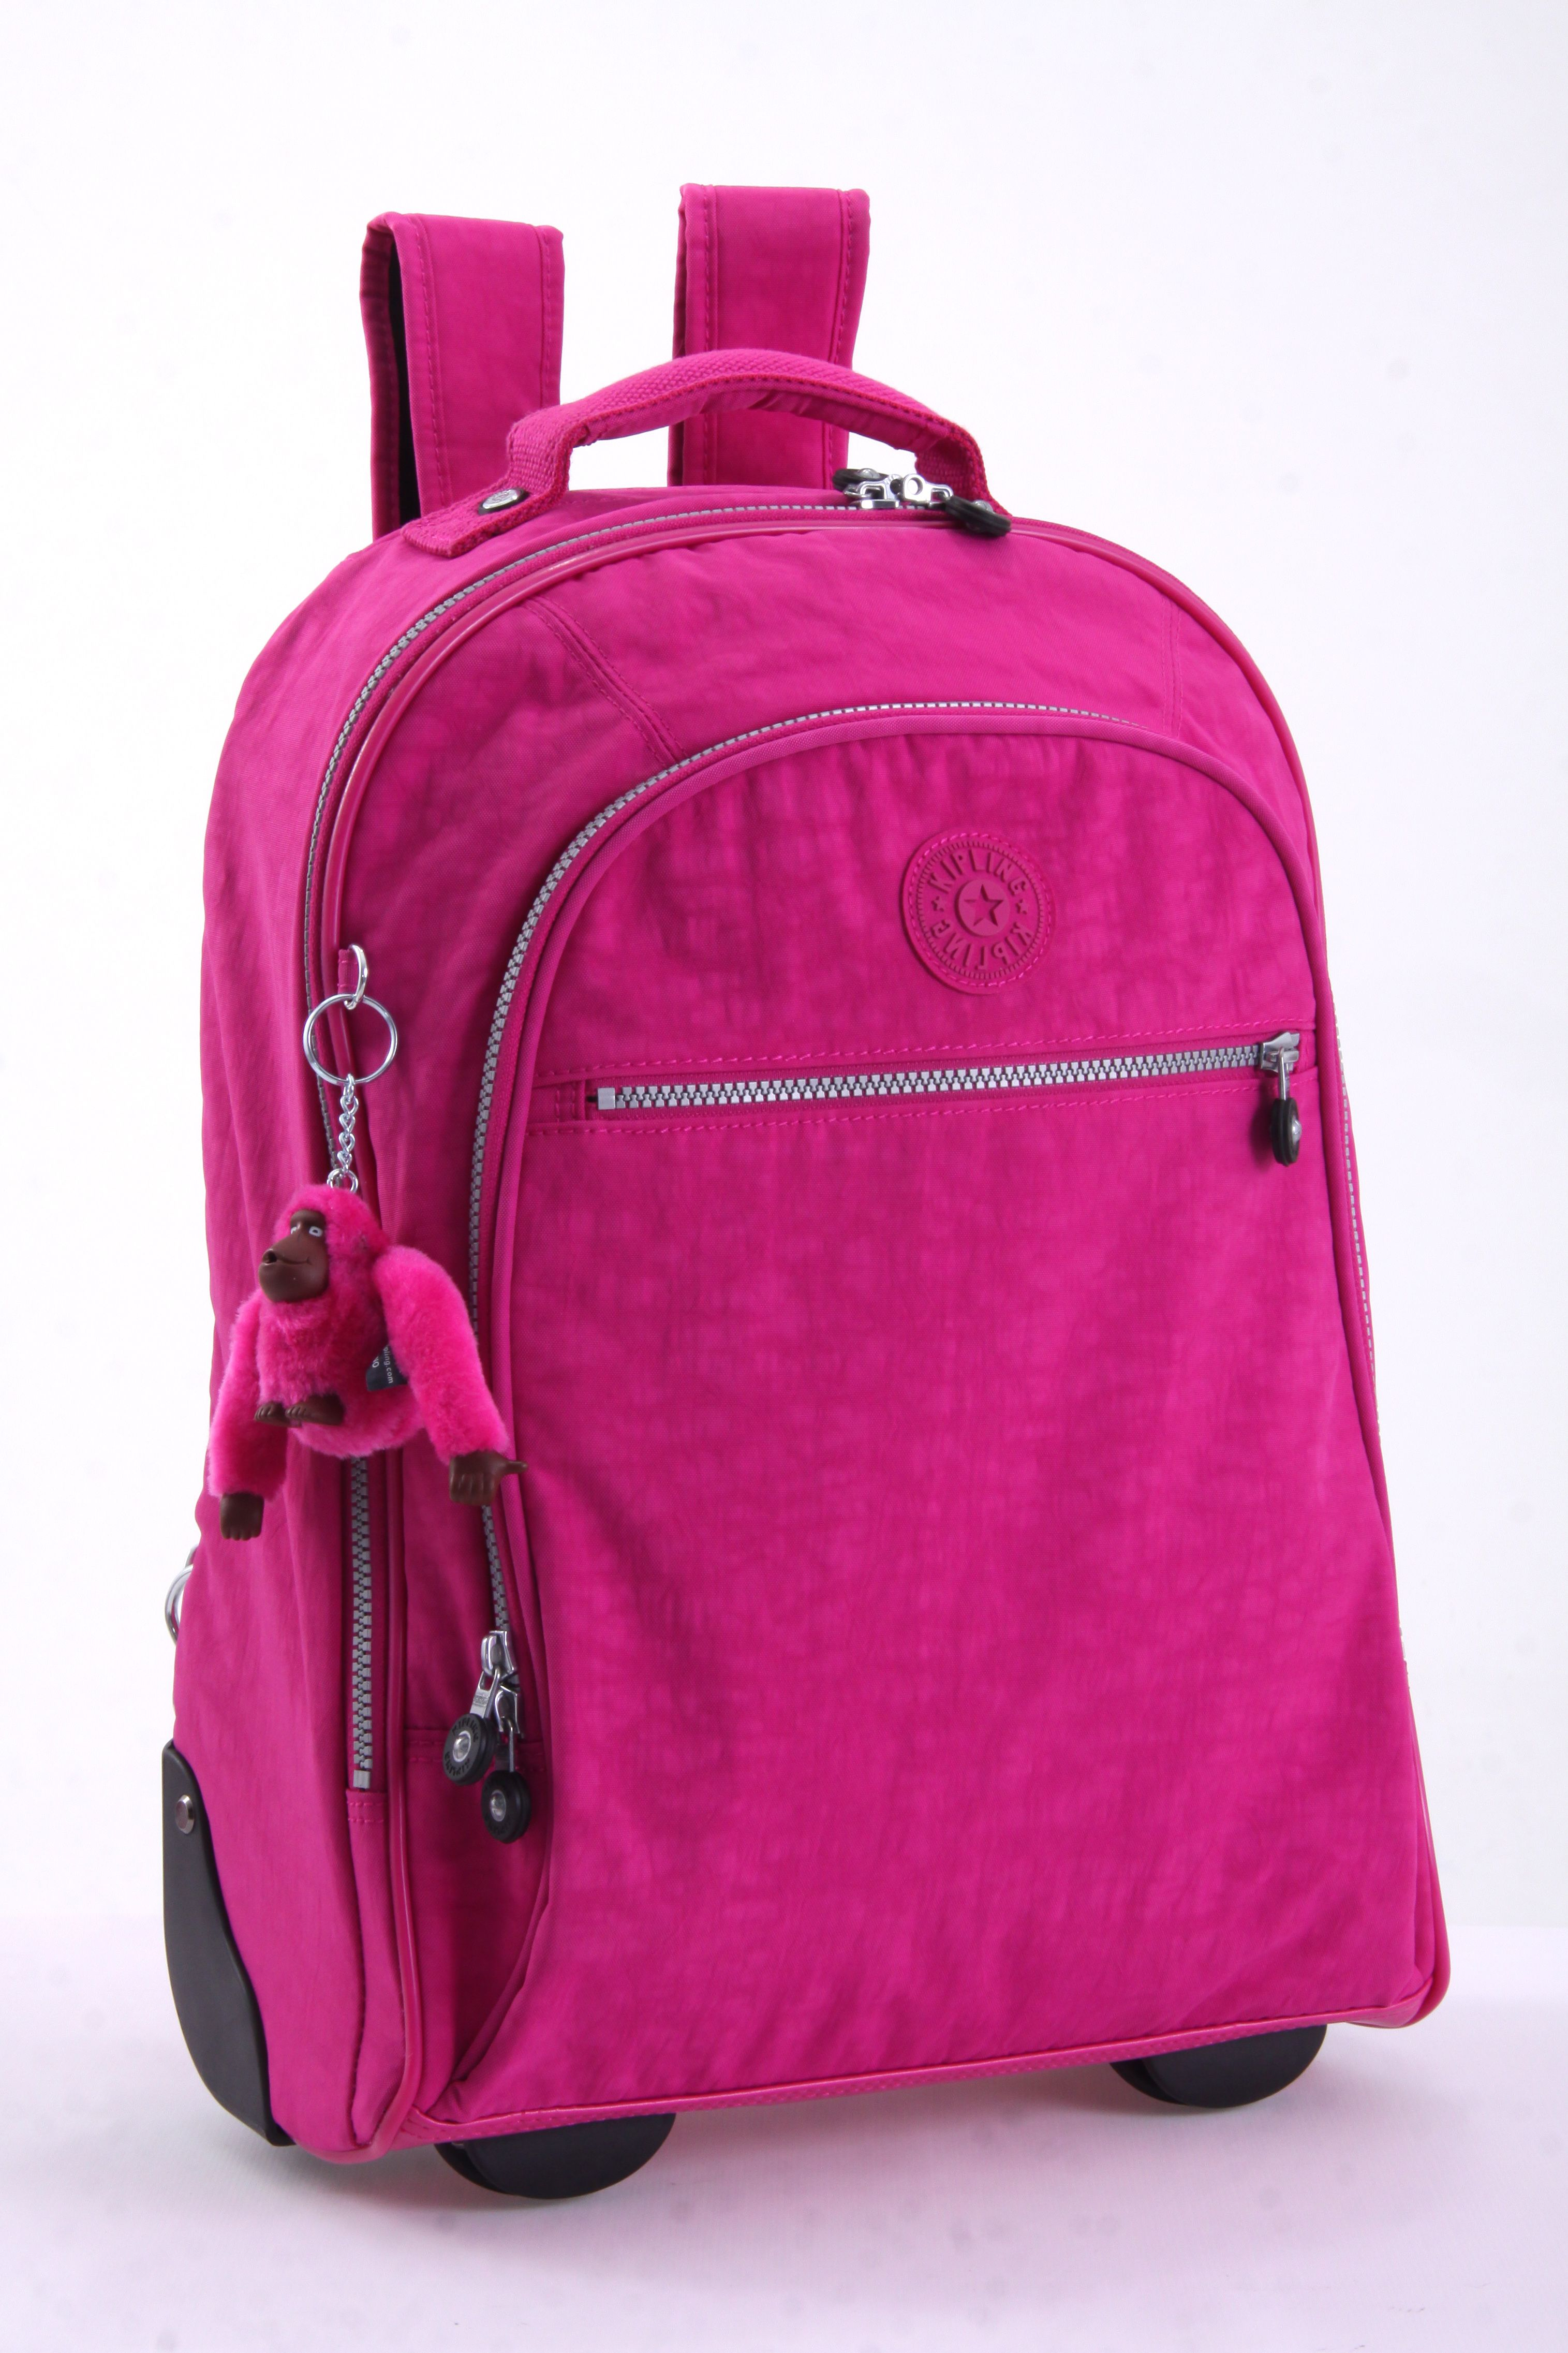 02acf5754 Kipling - Mochila com rodinhas - K13521 - R$699,00 | Backpacks ...